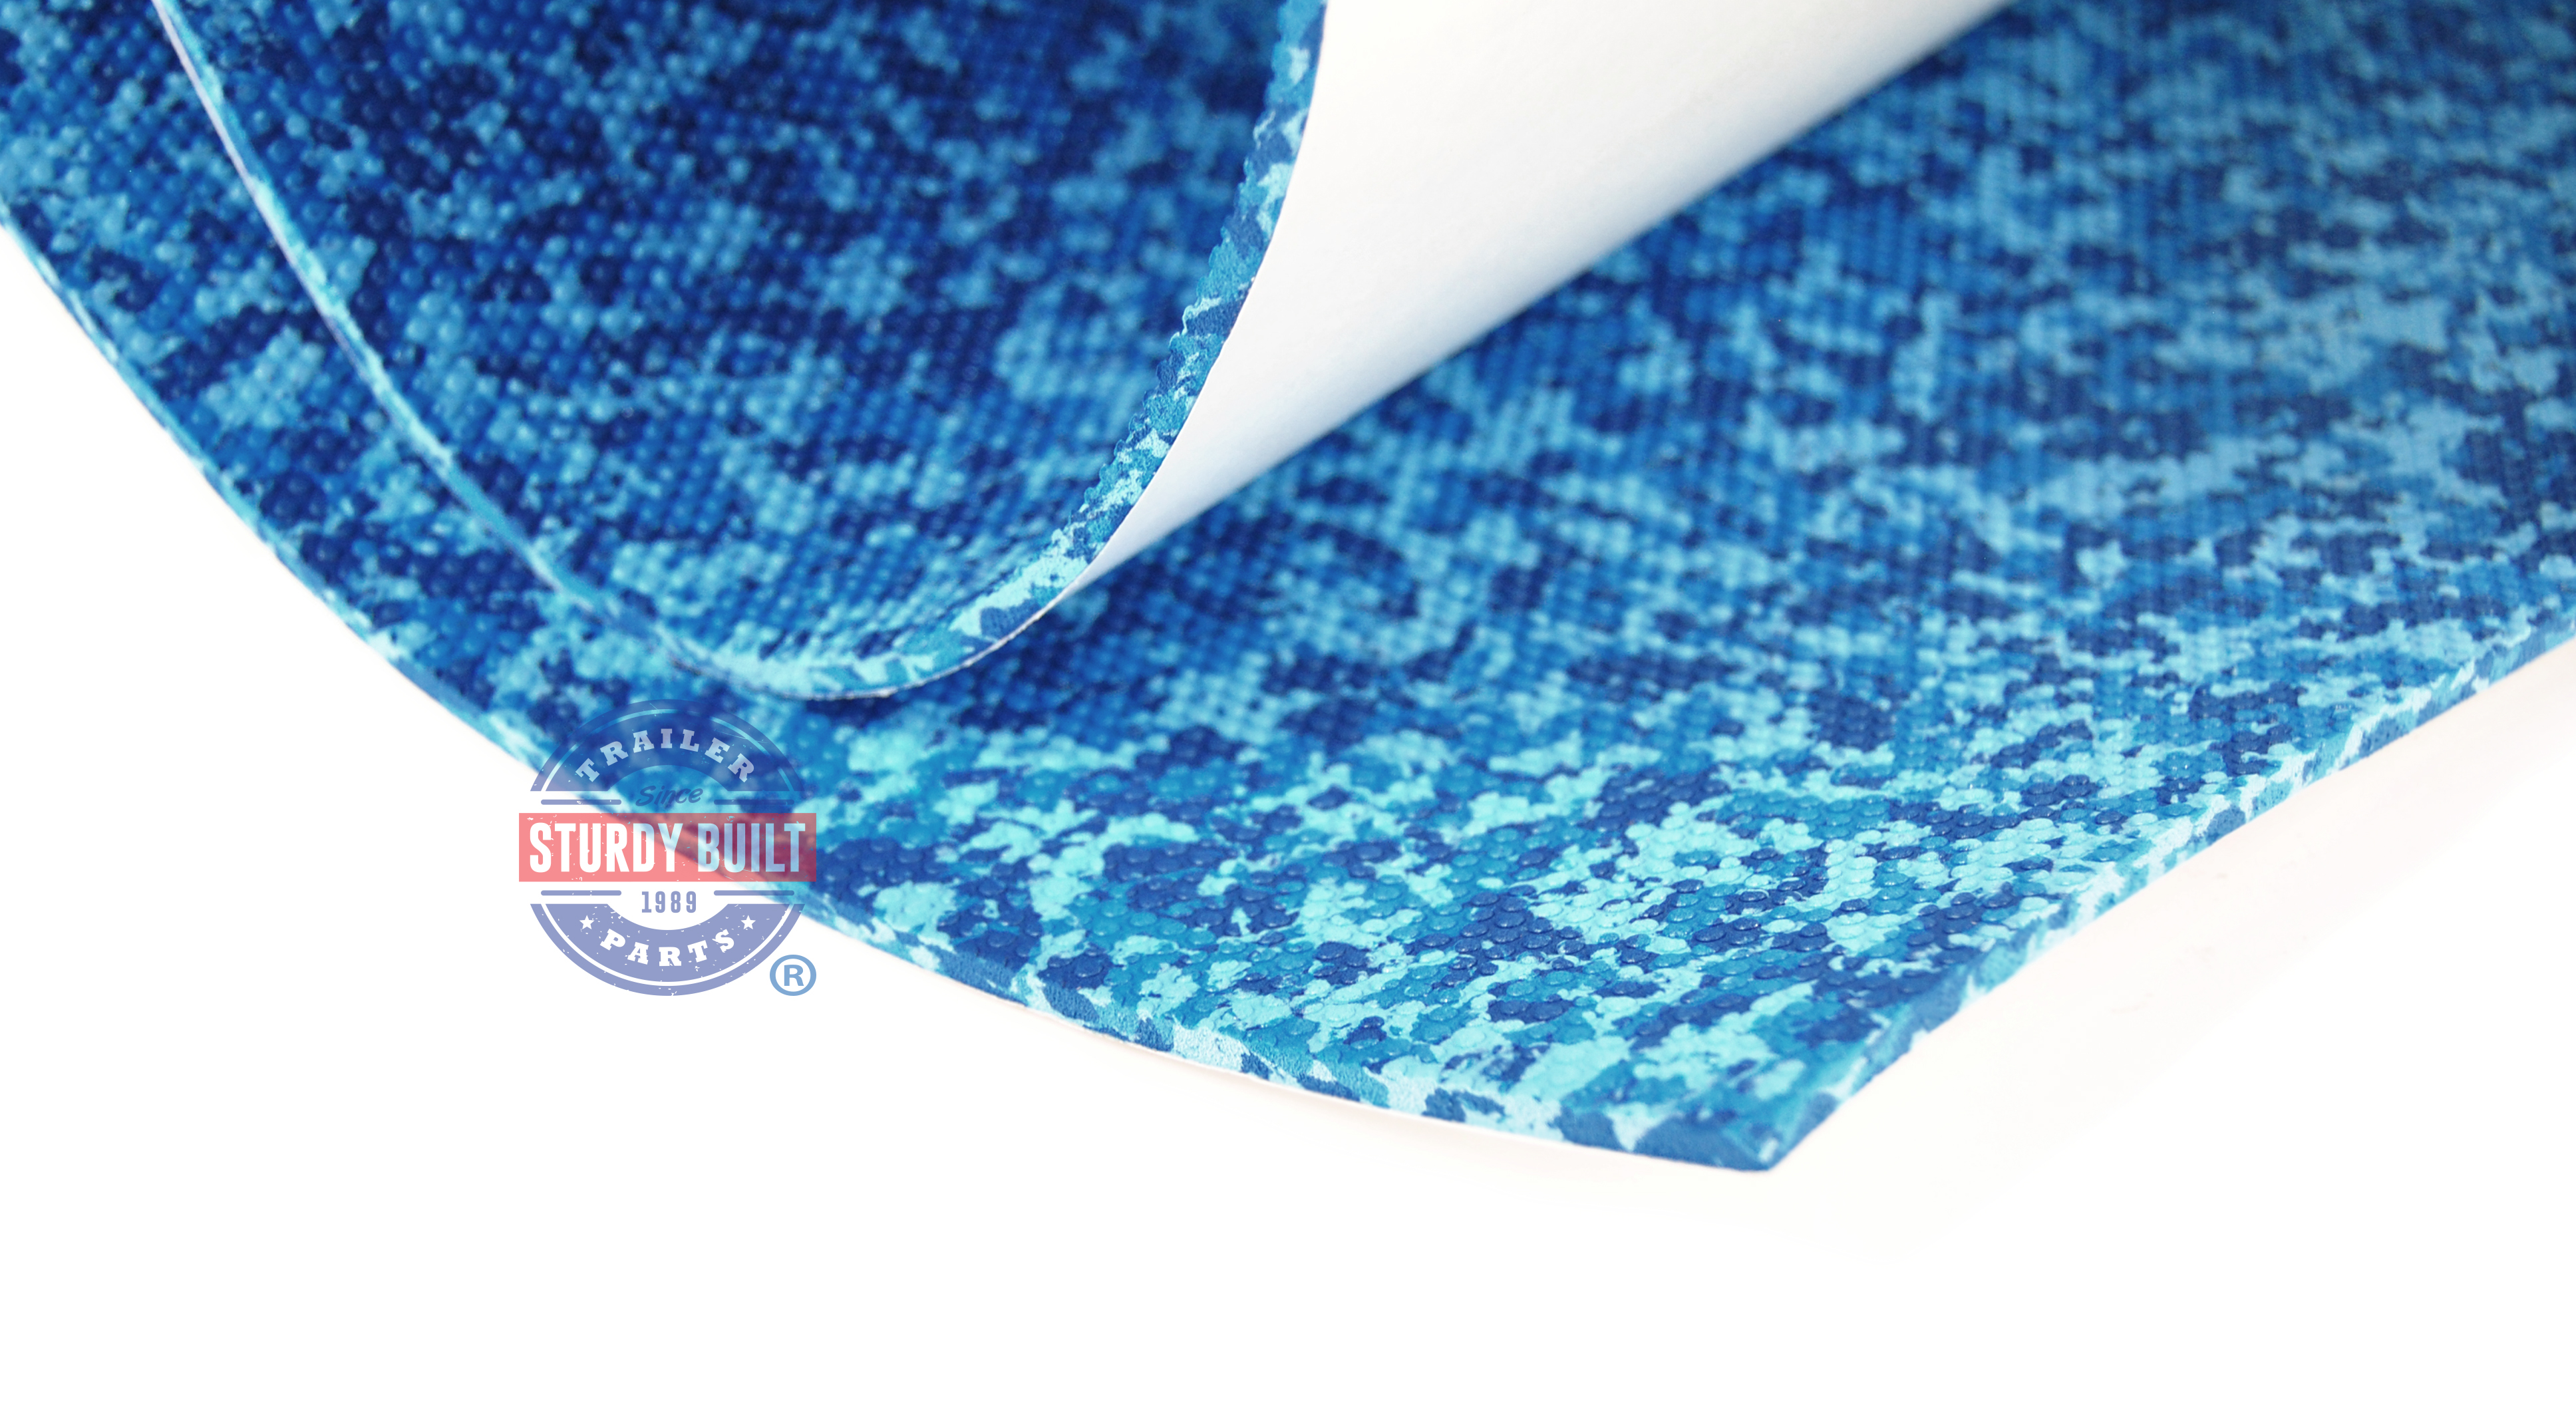 Seadek Marine Sheet Material 39 Inch X 77 Inch Aqua Camo